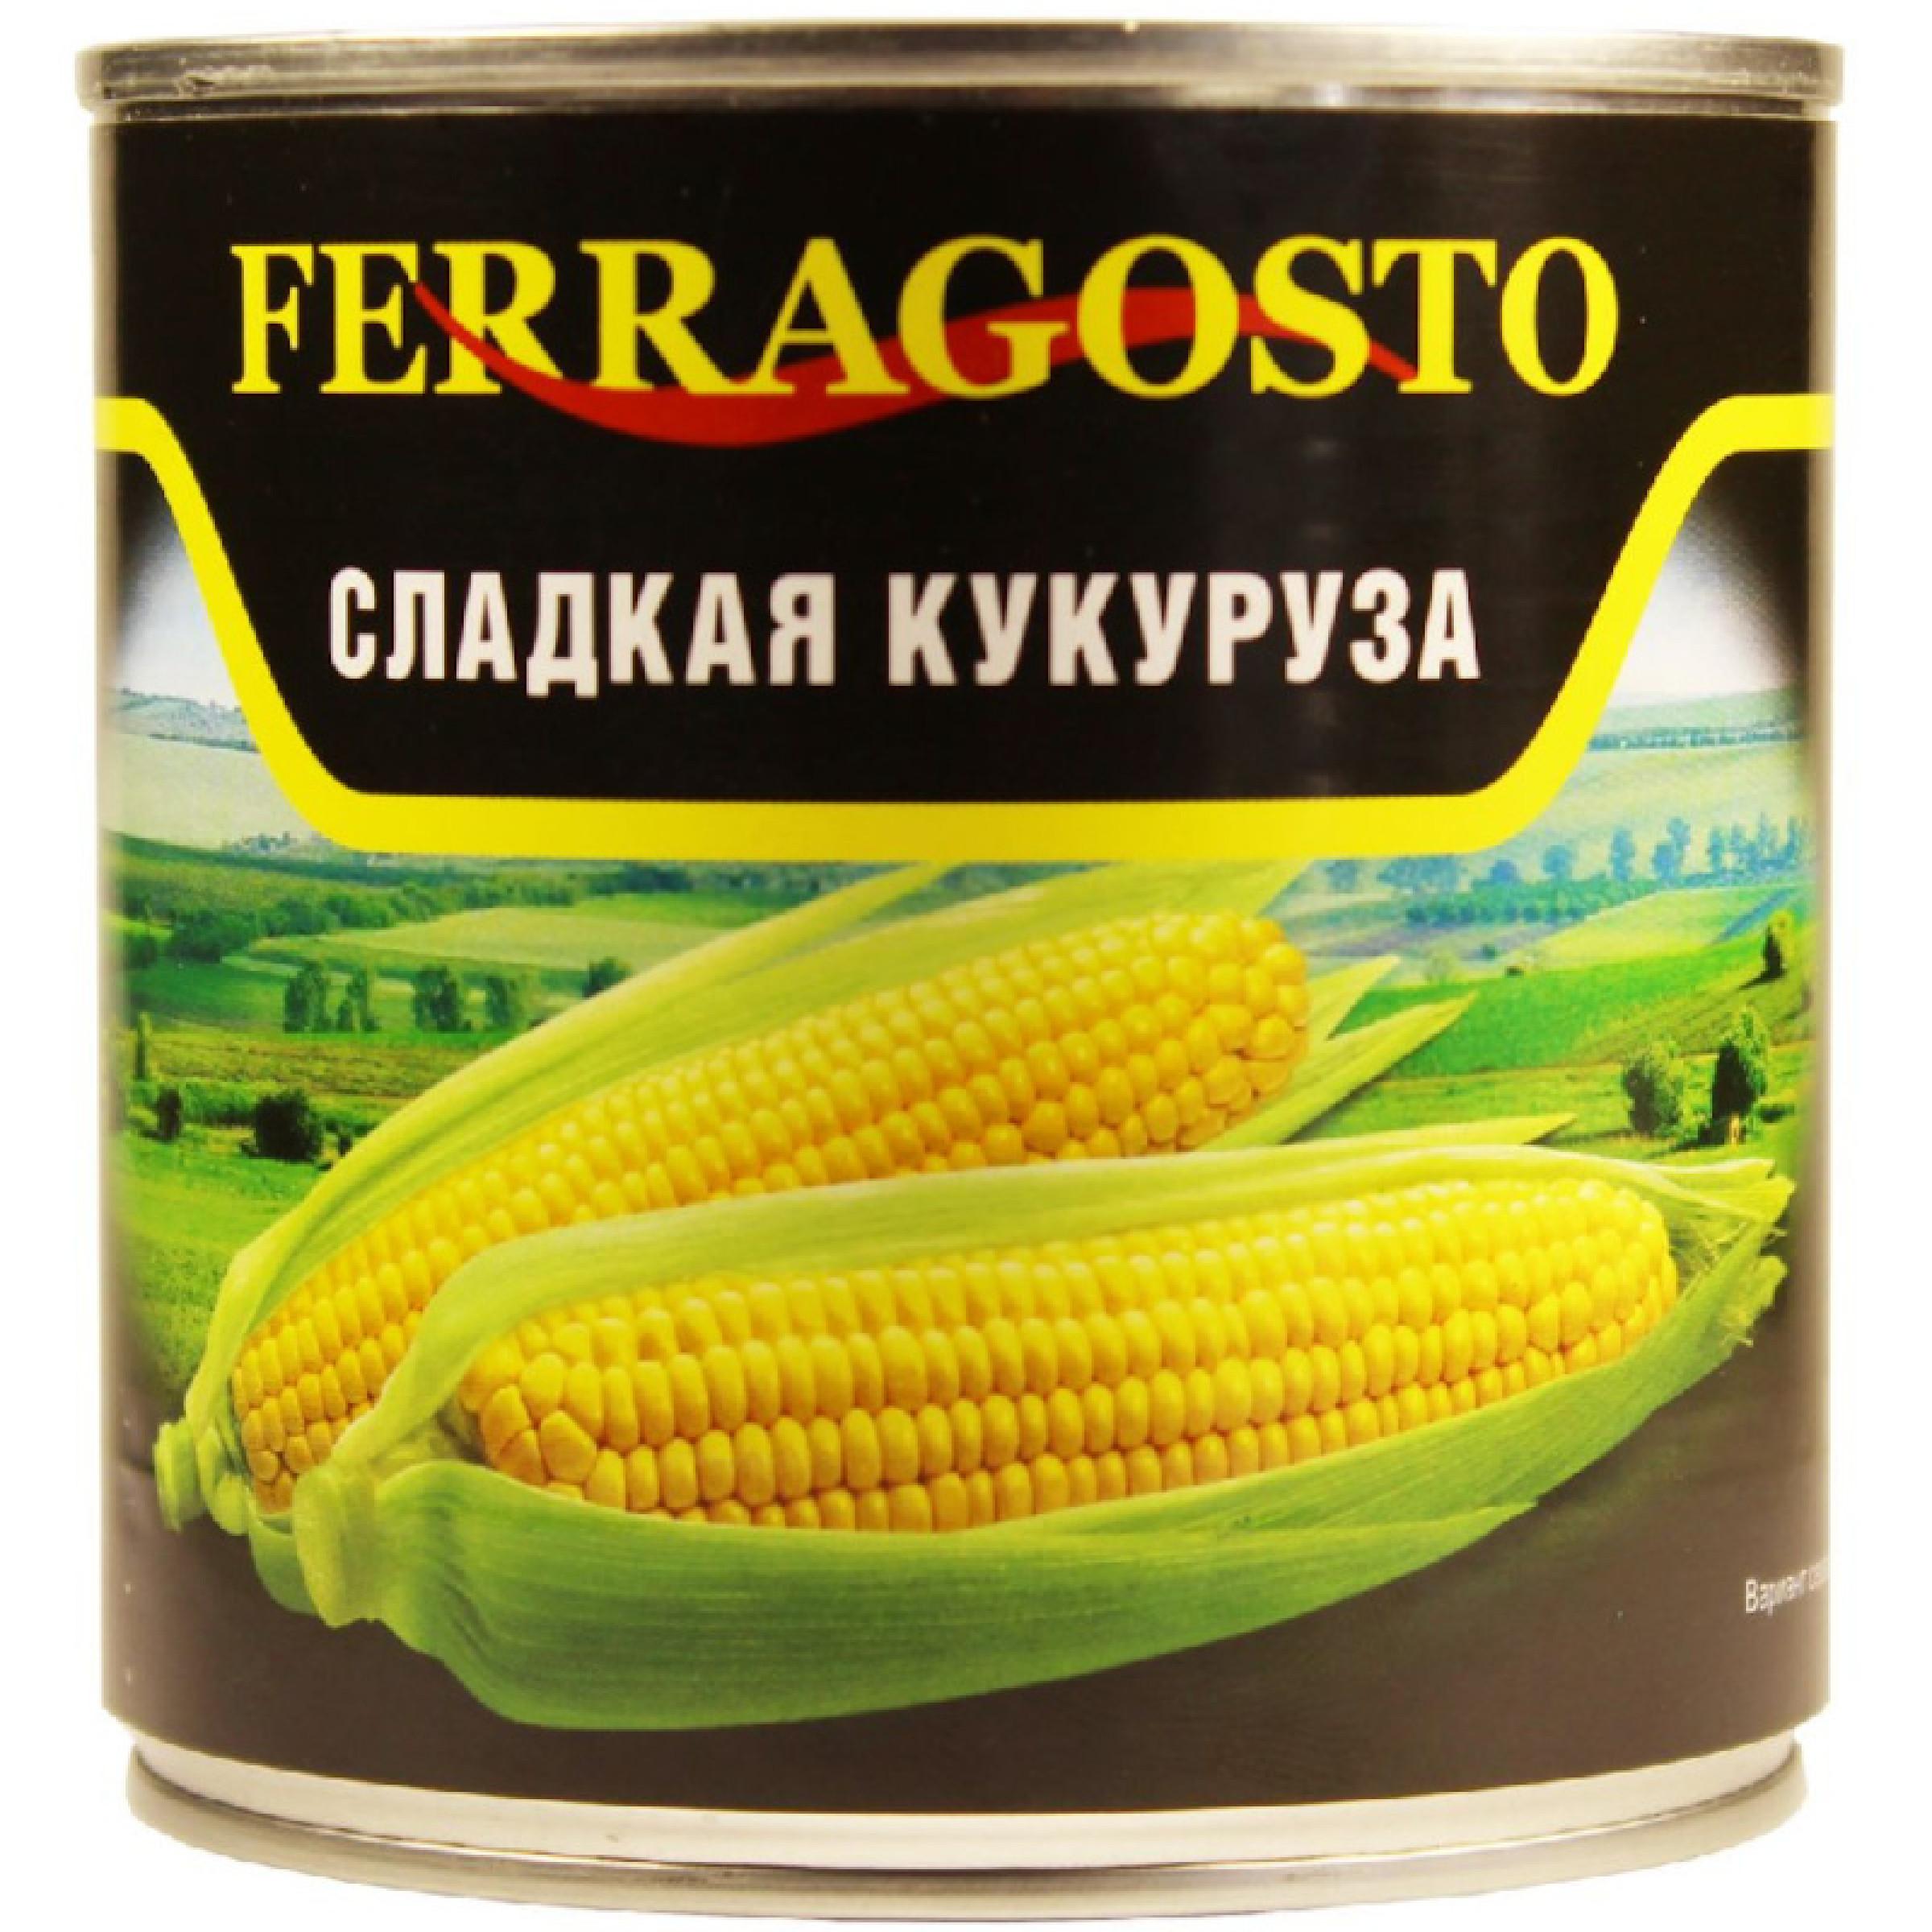 "Кукуруза ""Ferragosto"" сладкая, 425 мл"